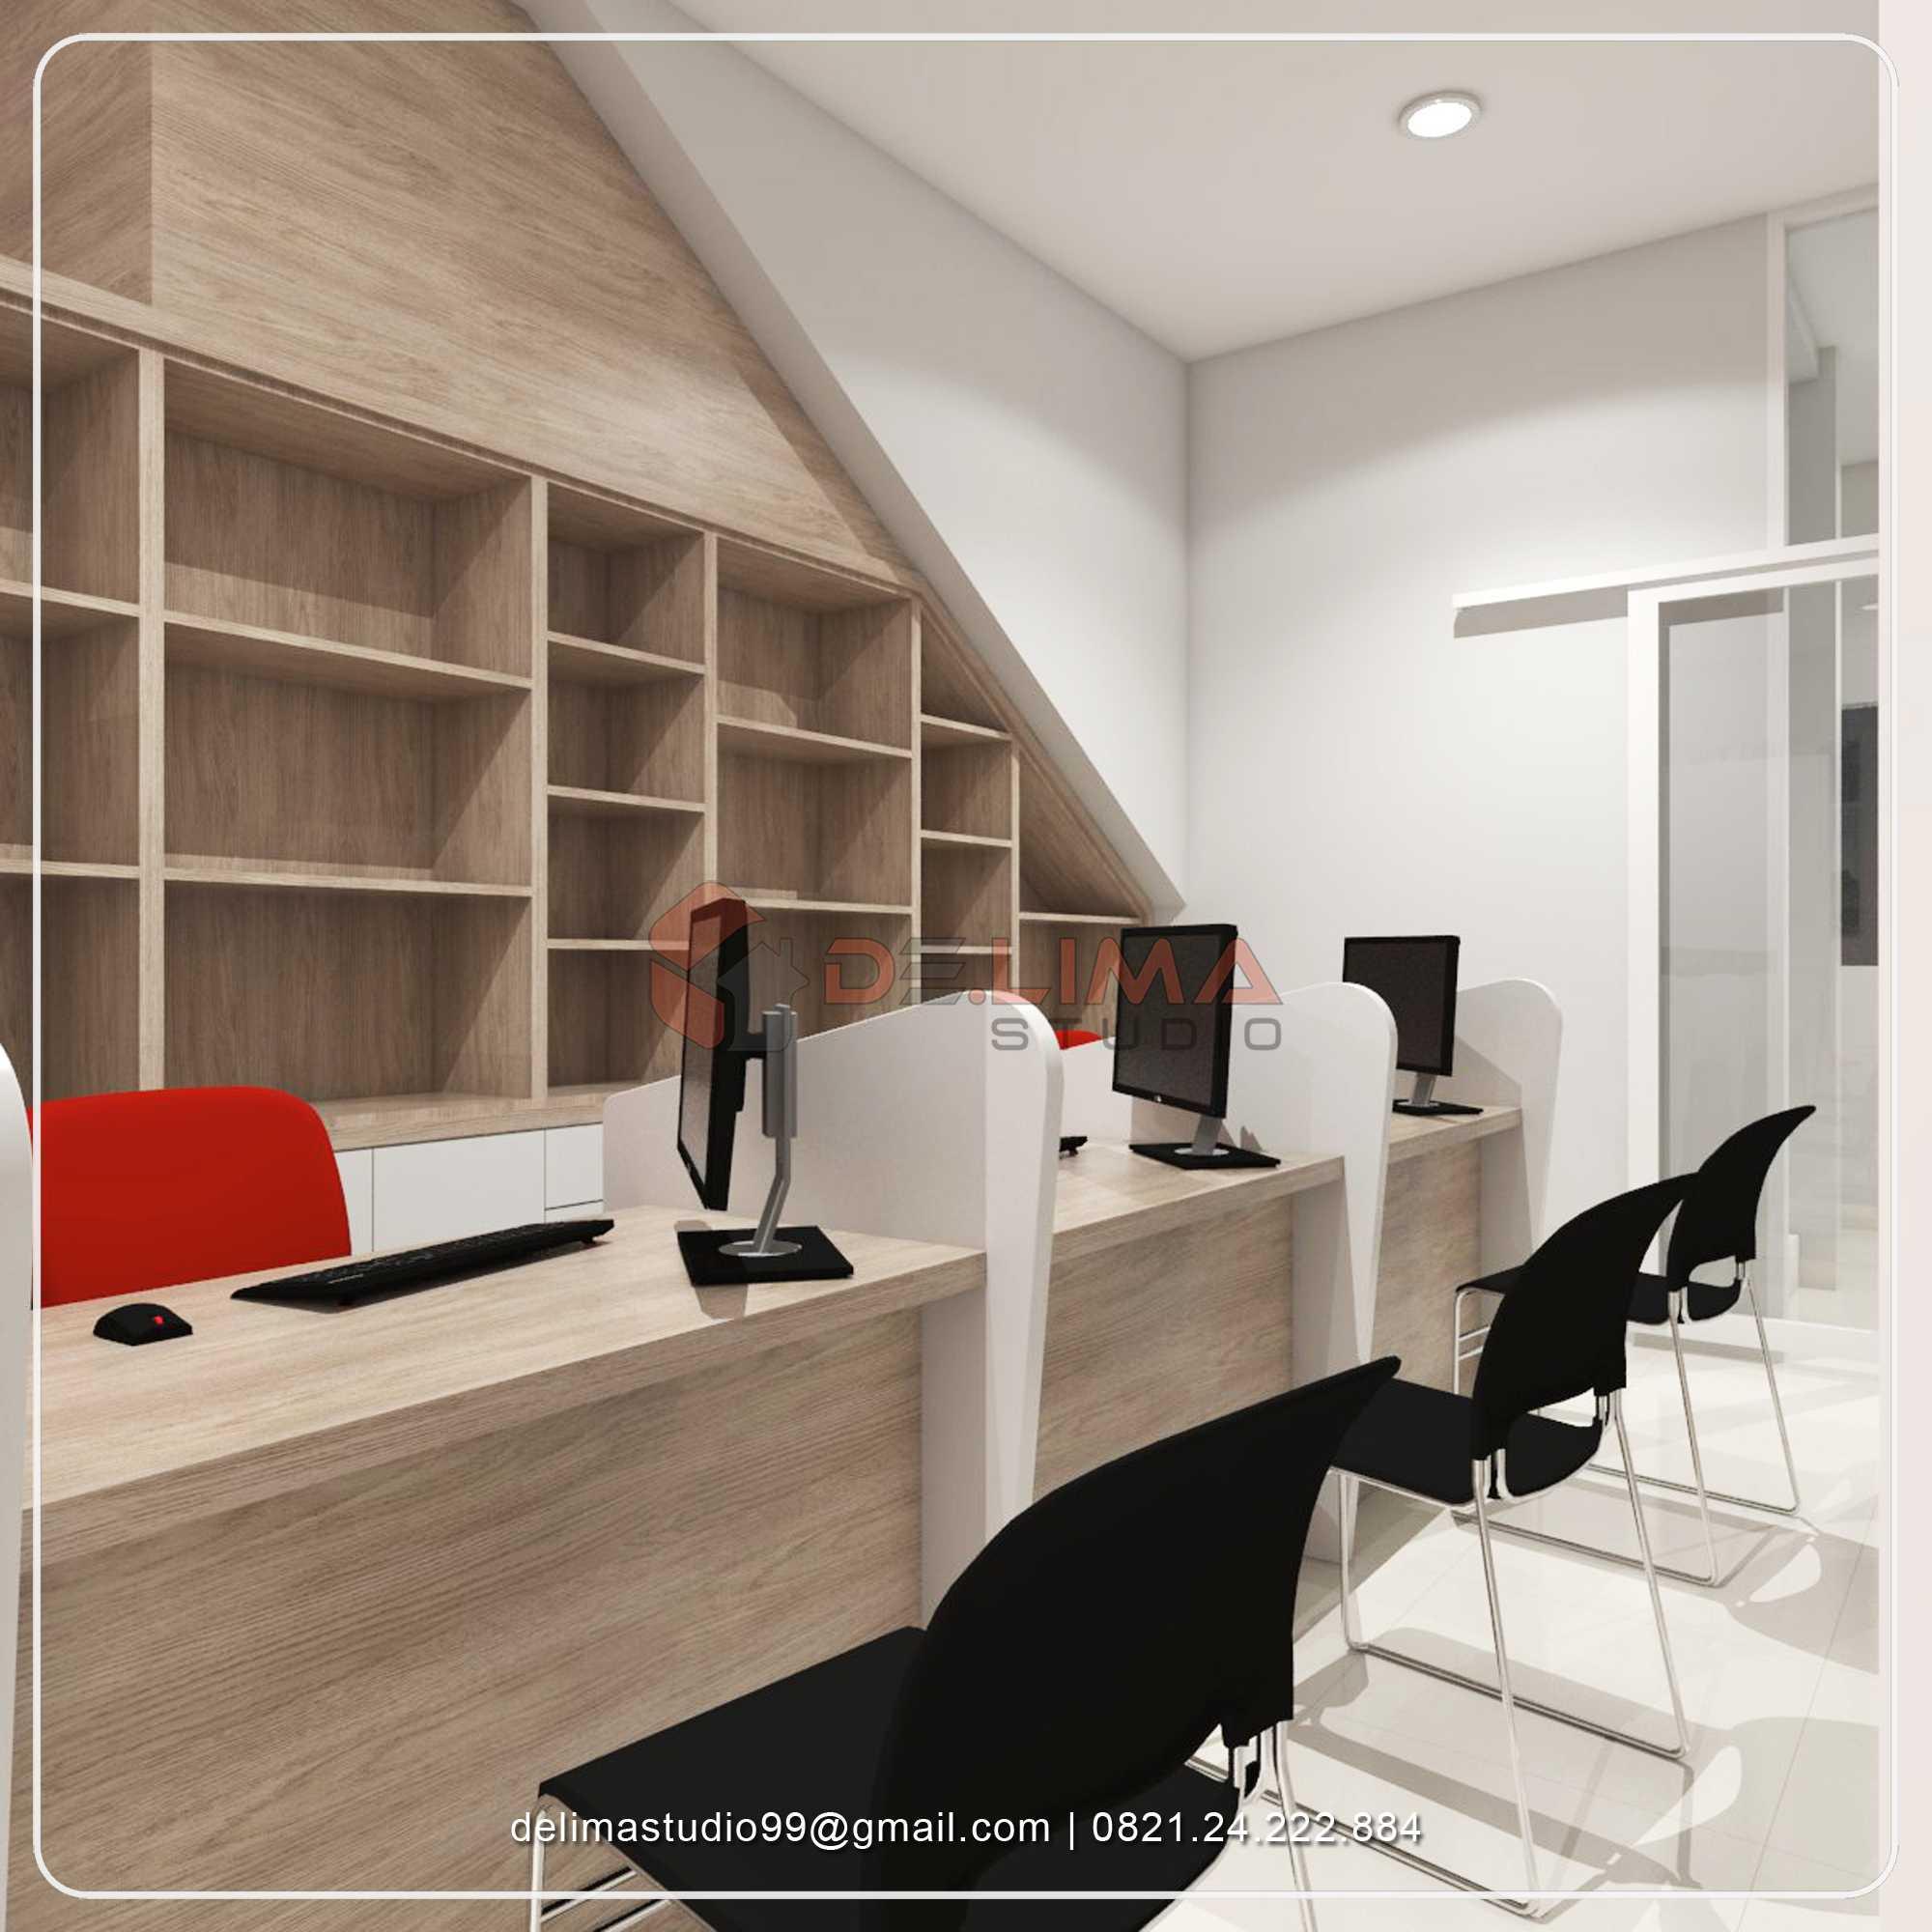 Delima Studio Office At Cikarang Sukamahi, Kec. Cikarang Pusat, Bekasi, Jawa Barat 17530, Indonesia Sukamahi, Kec. Cikarang Pusat, Bekasi, Jawa Barat 17530, Indonesia Delima-Studio-Office-At-Cikarang Modern Ruang Customer Service 77708